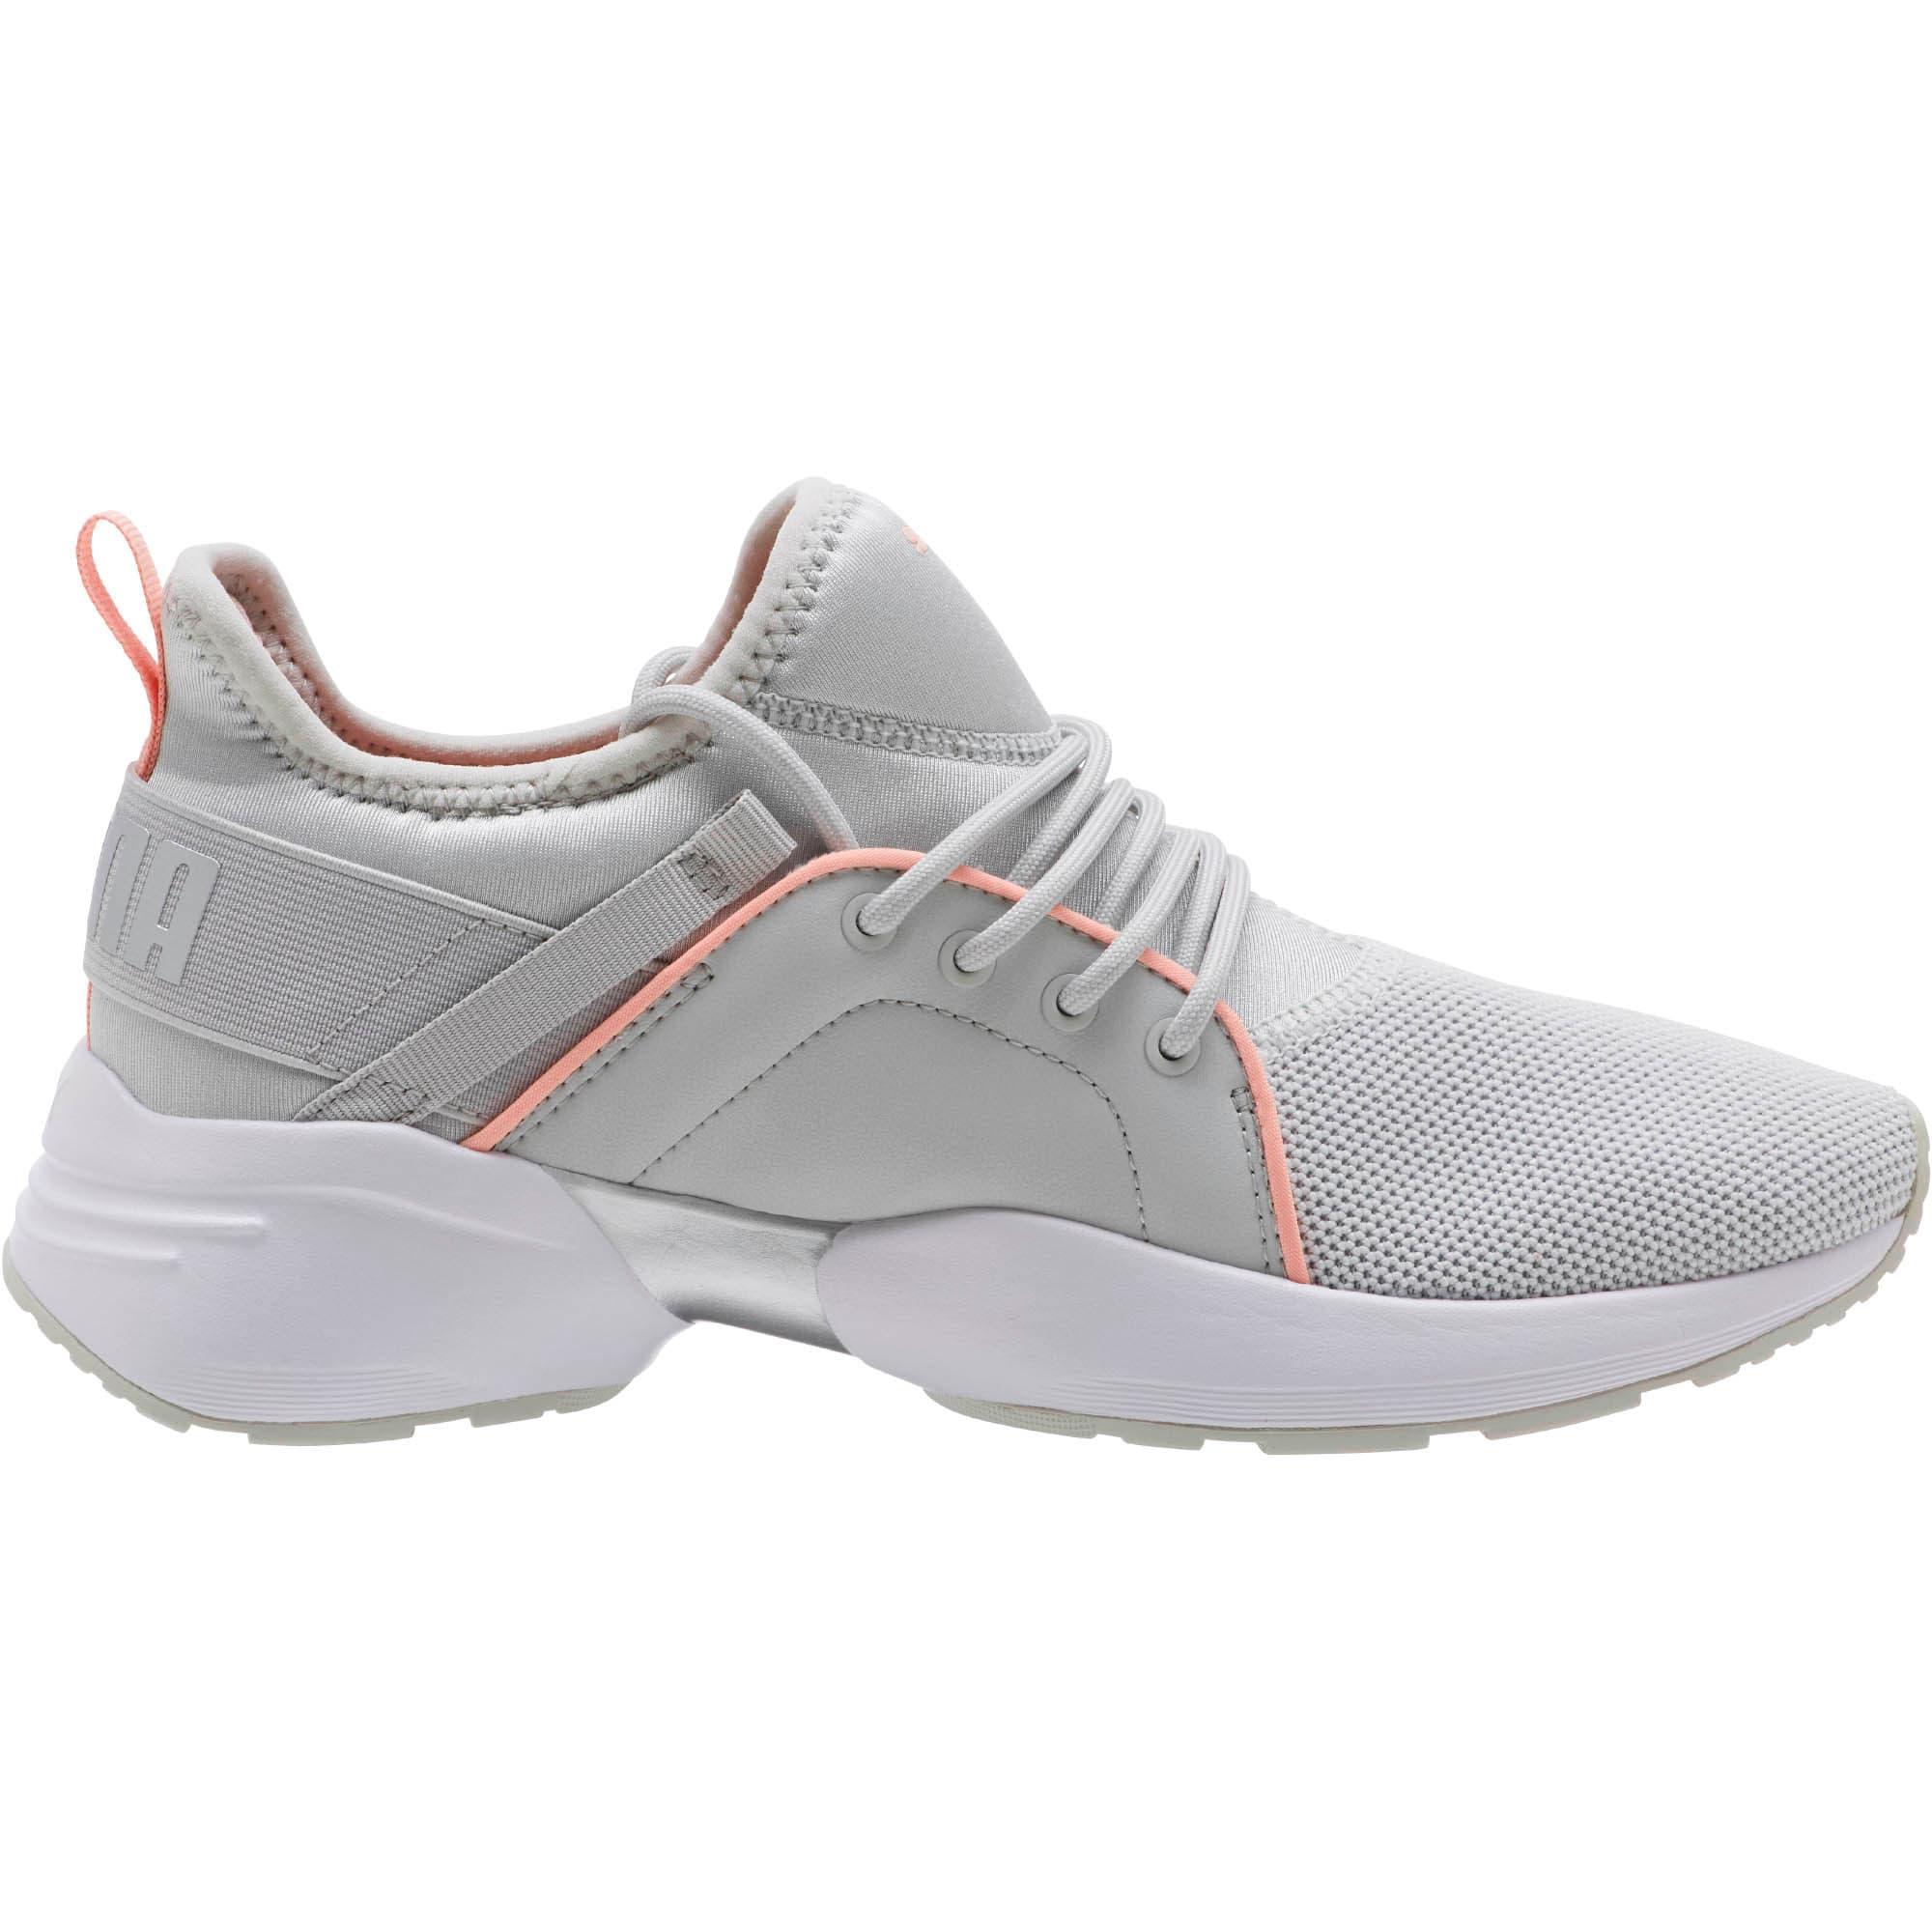 Thumbnail 3 of Sirena Women's Training Shoes, Glacier Gray-Peach Bud, medium